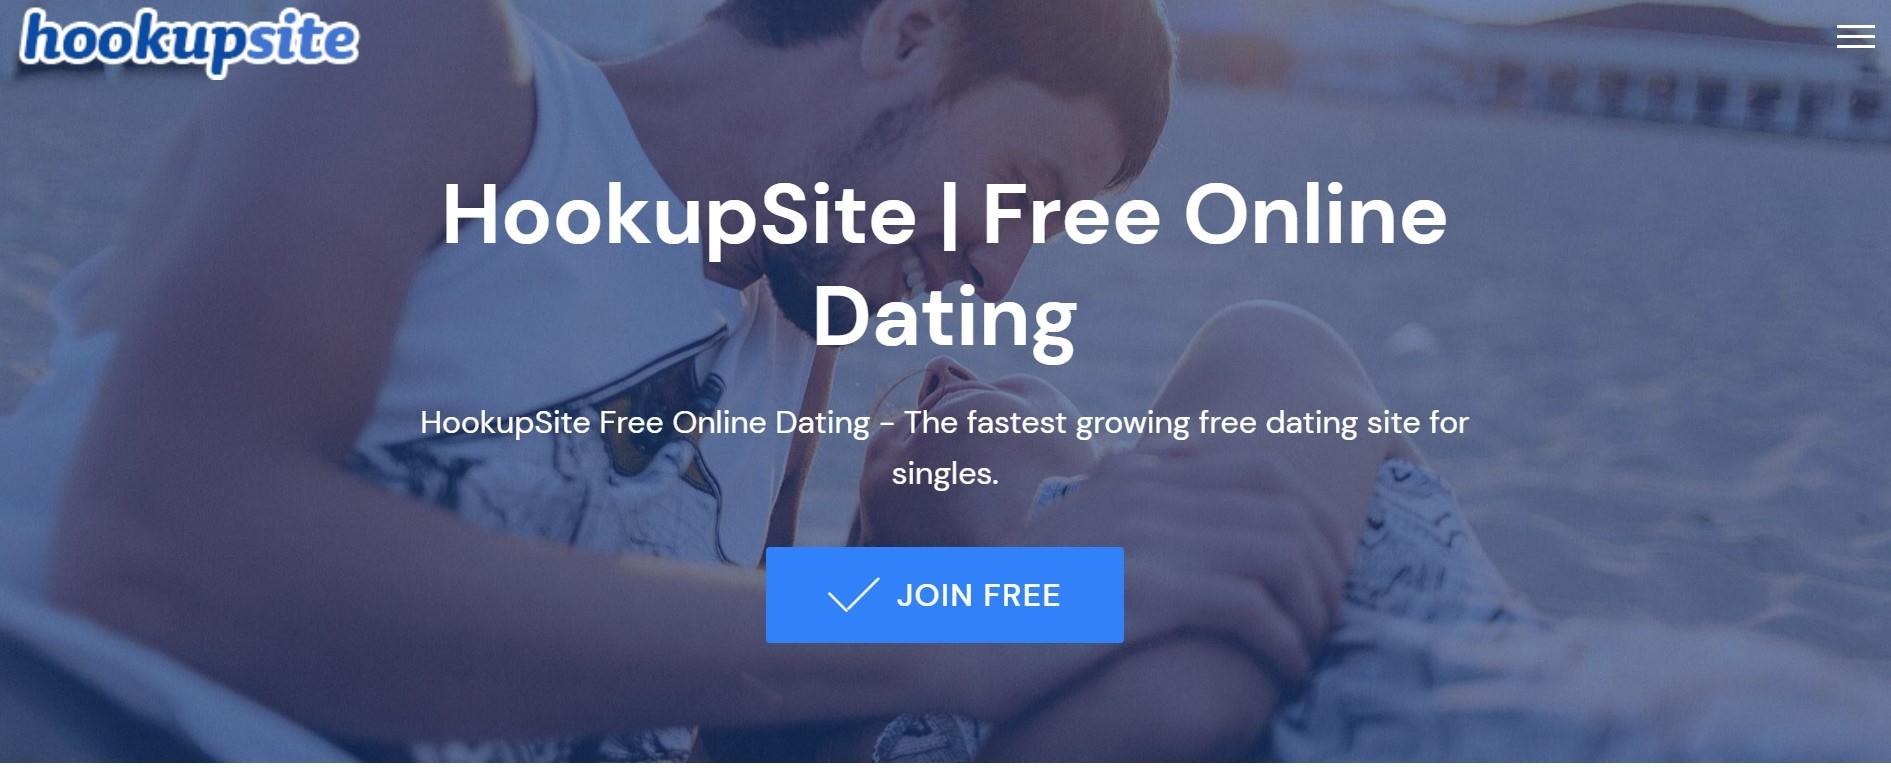 Hookupsite Dating (@hookupsite_dating) Cover Image